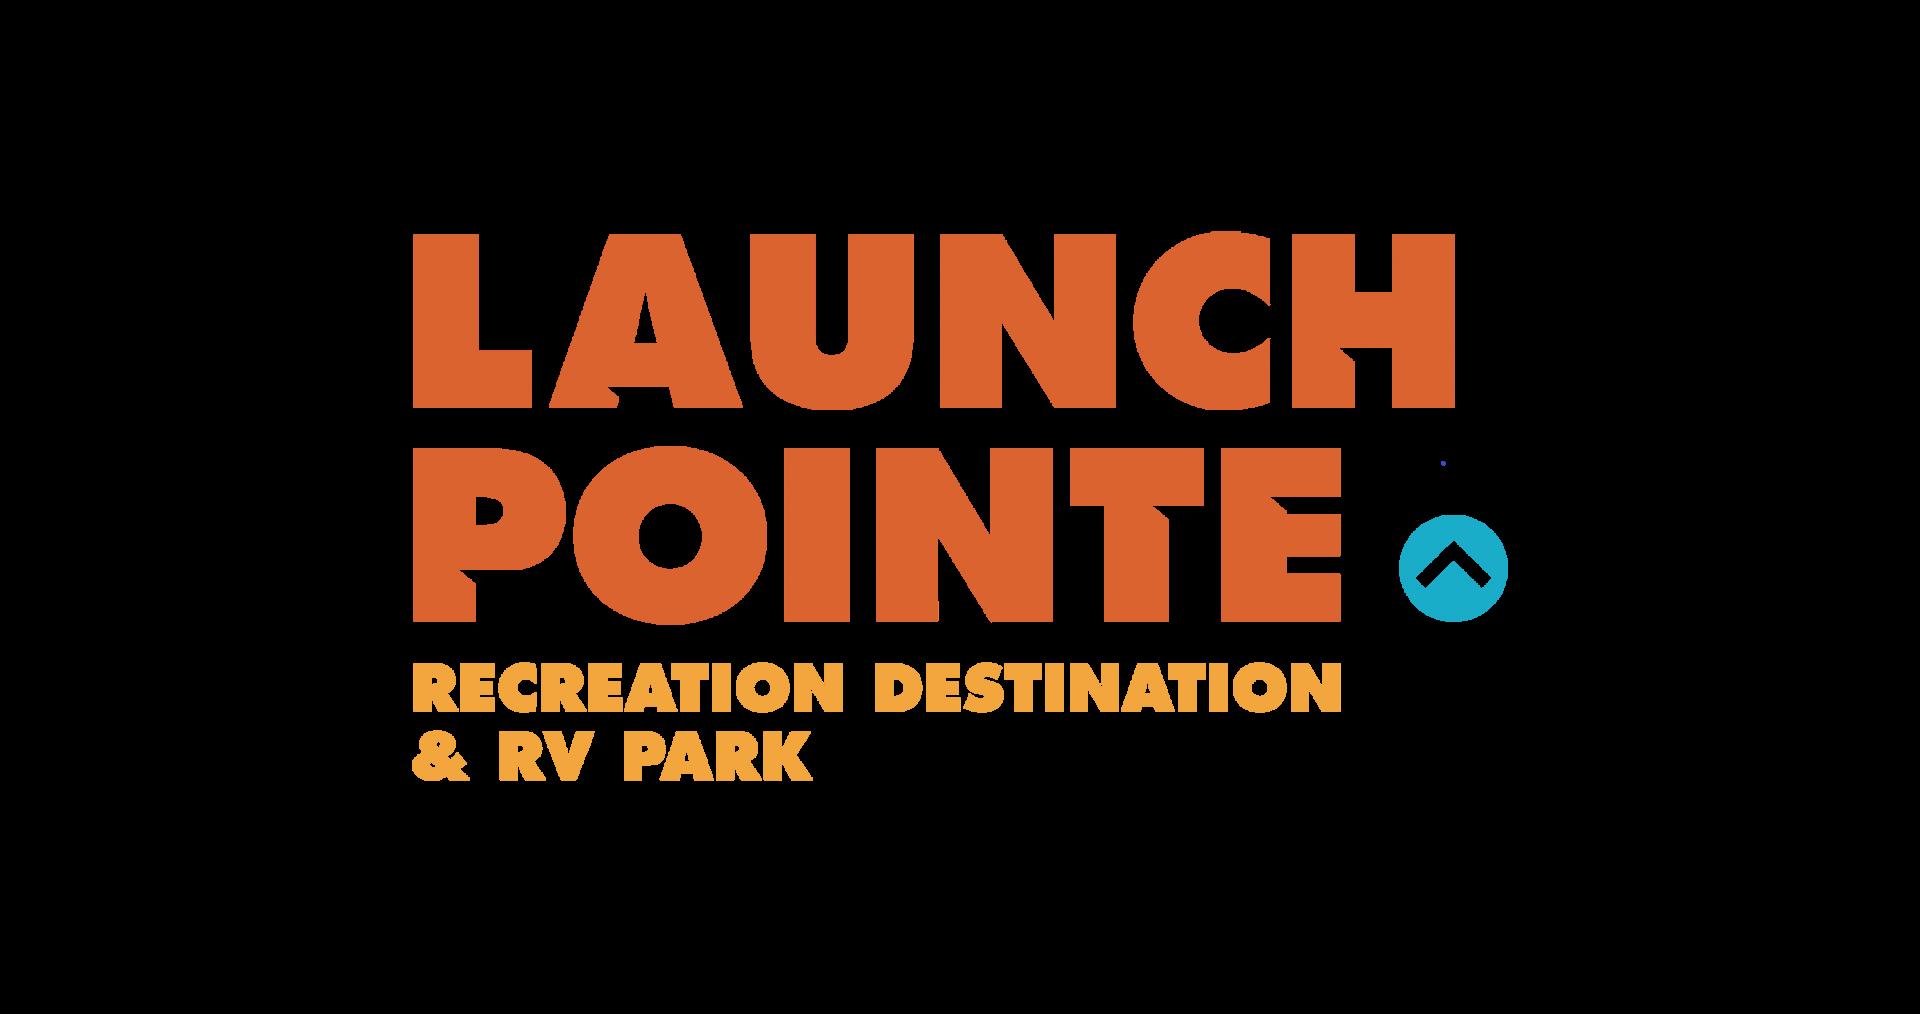 Launch Pointe Recreation Destination Amp Rv Park